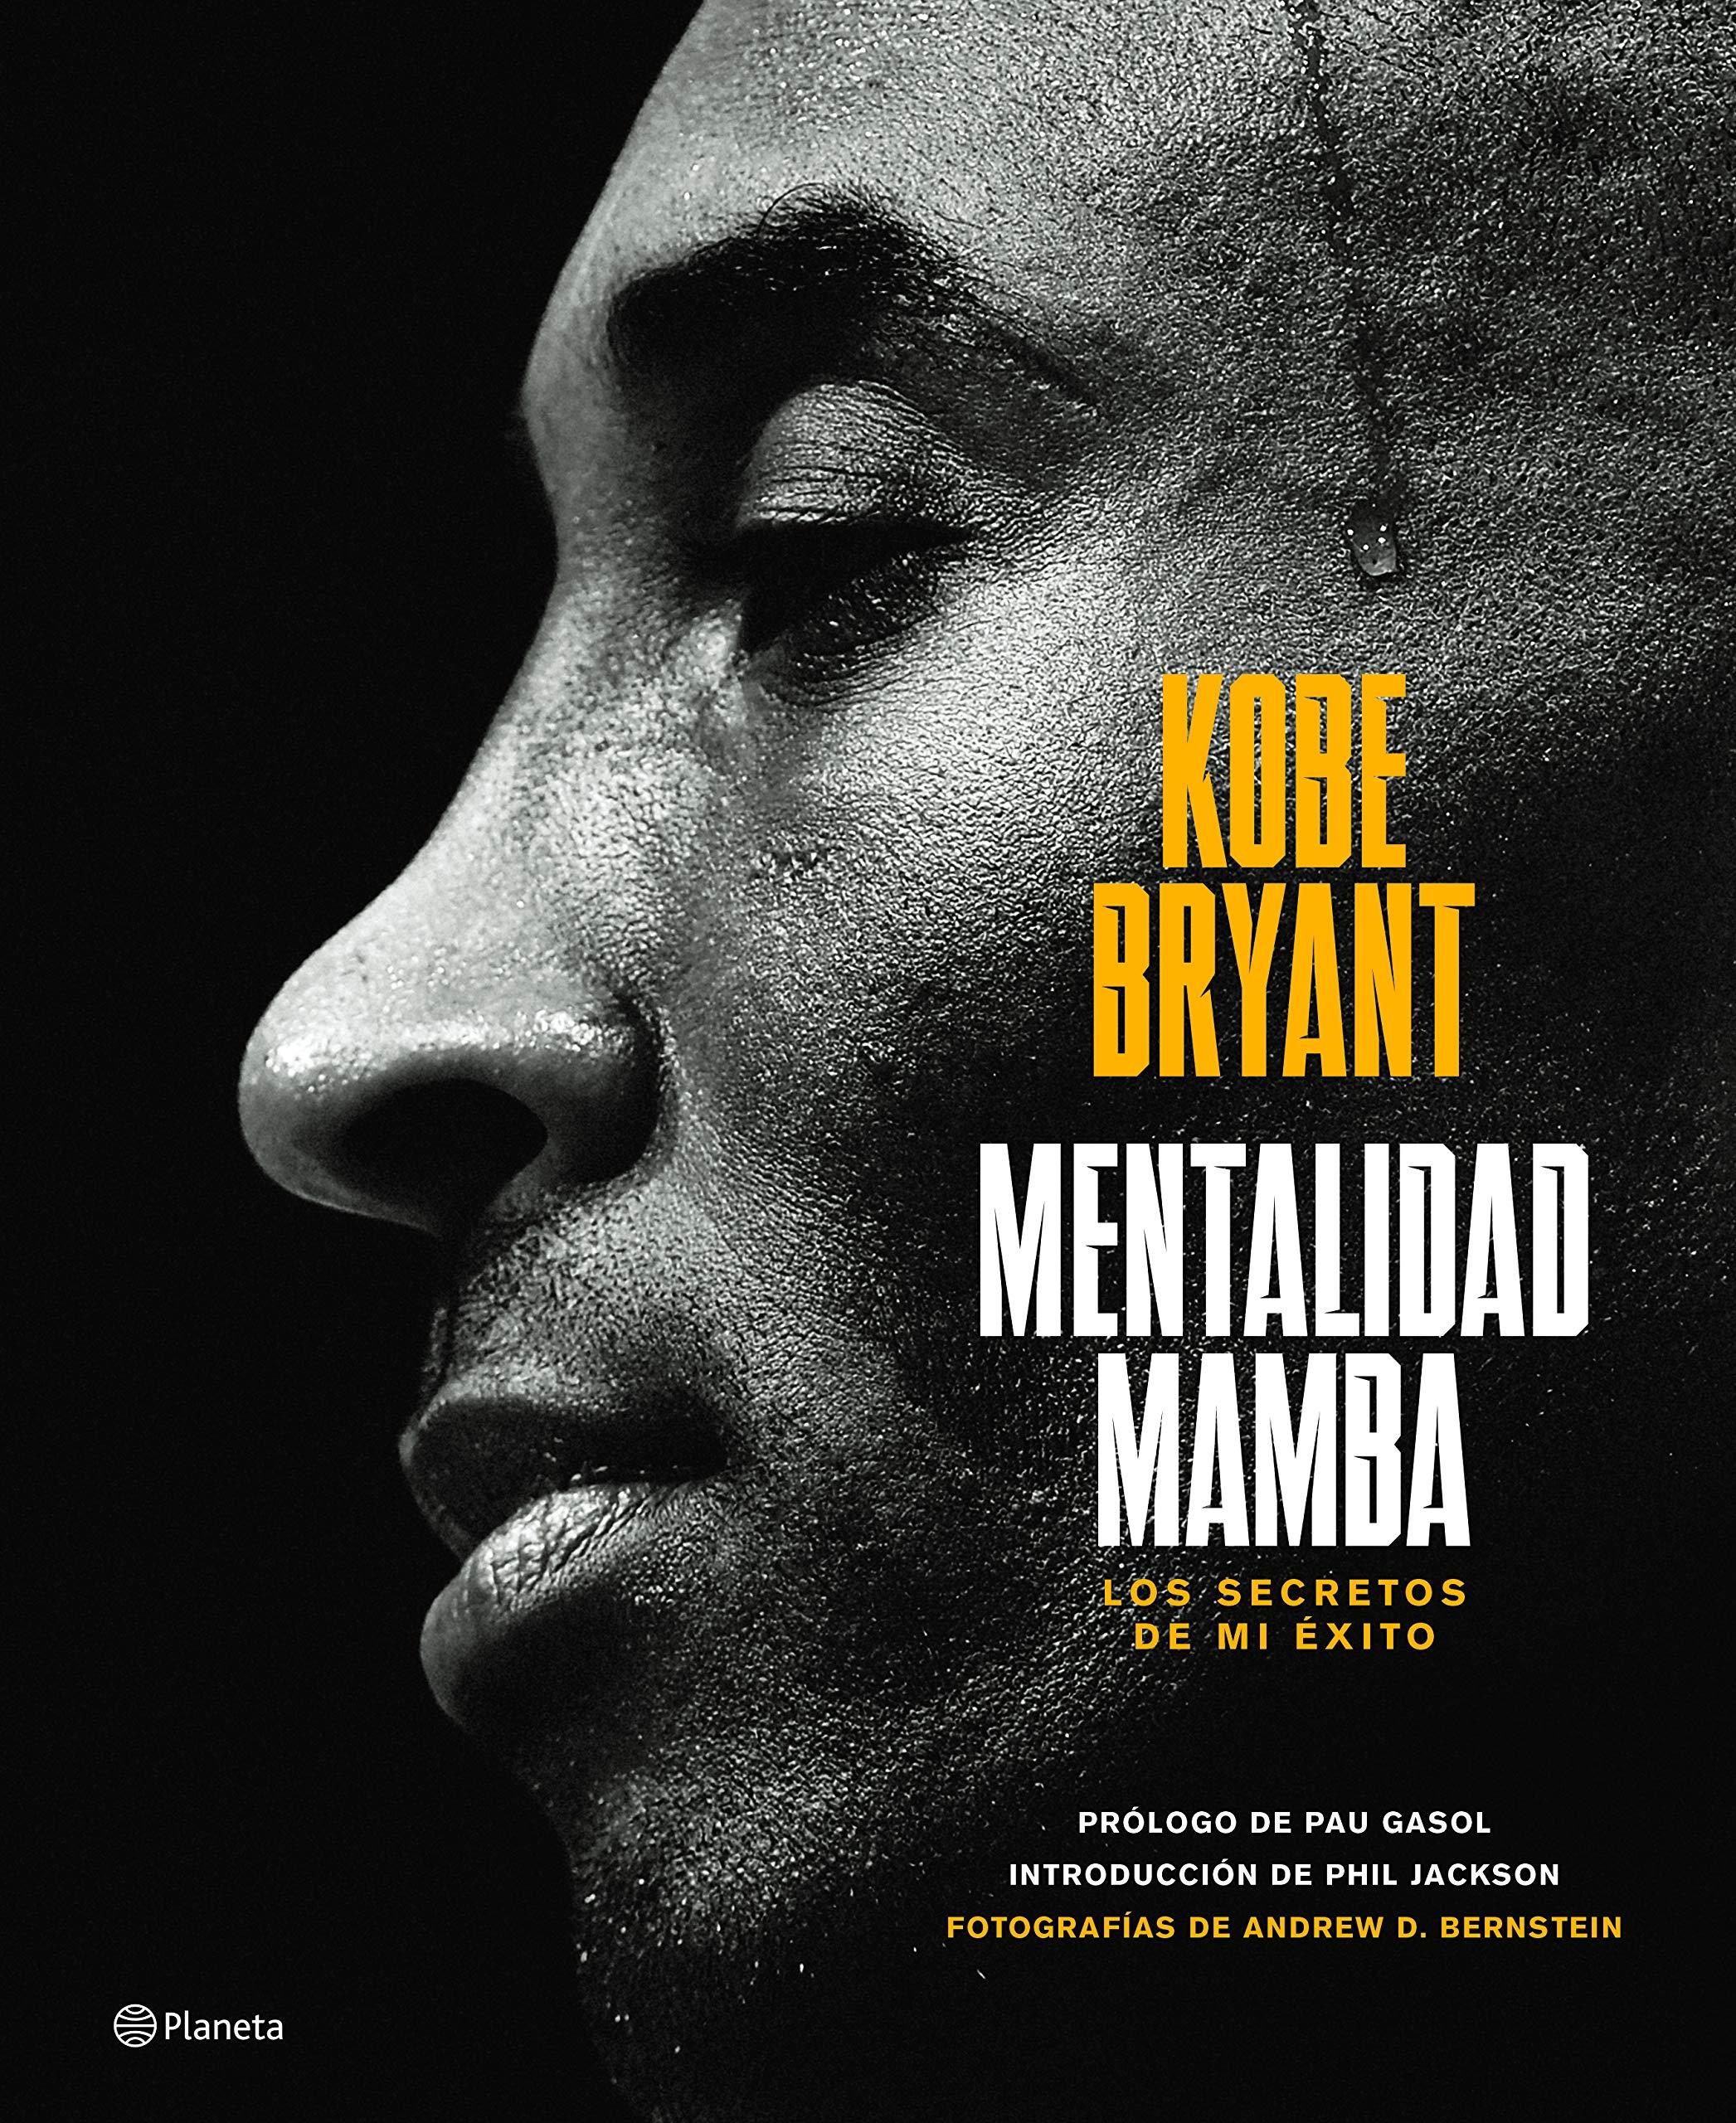 Amazon Com Mentalidad Mamba The Mamba Mentality Los Secretos De Mi Exito Spanish Edition 9786070767302 Bryant Kobe Libros